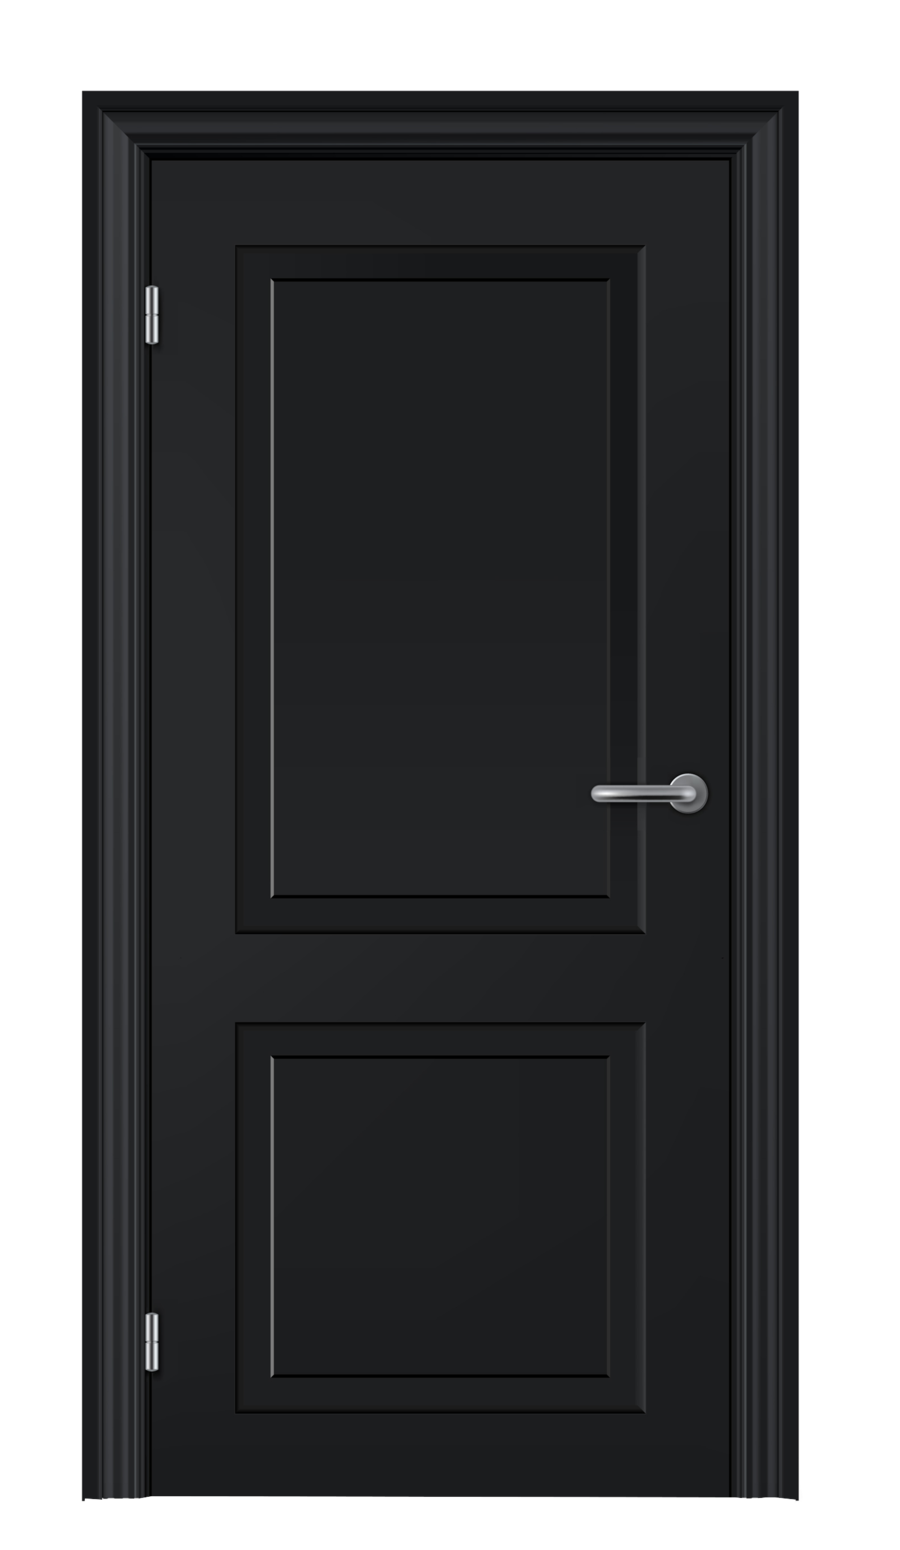 Pin De Charudeal Em Doors Cenario Anime Chroma Key Cenario Para Videos